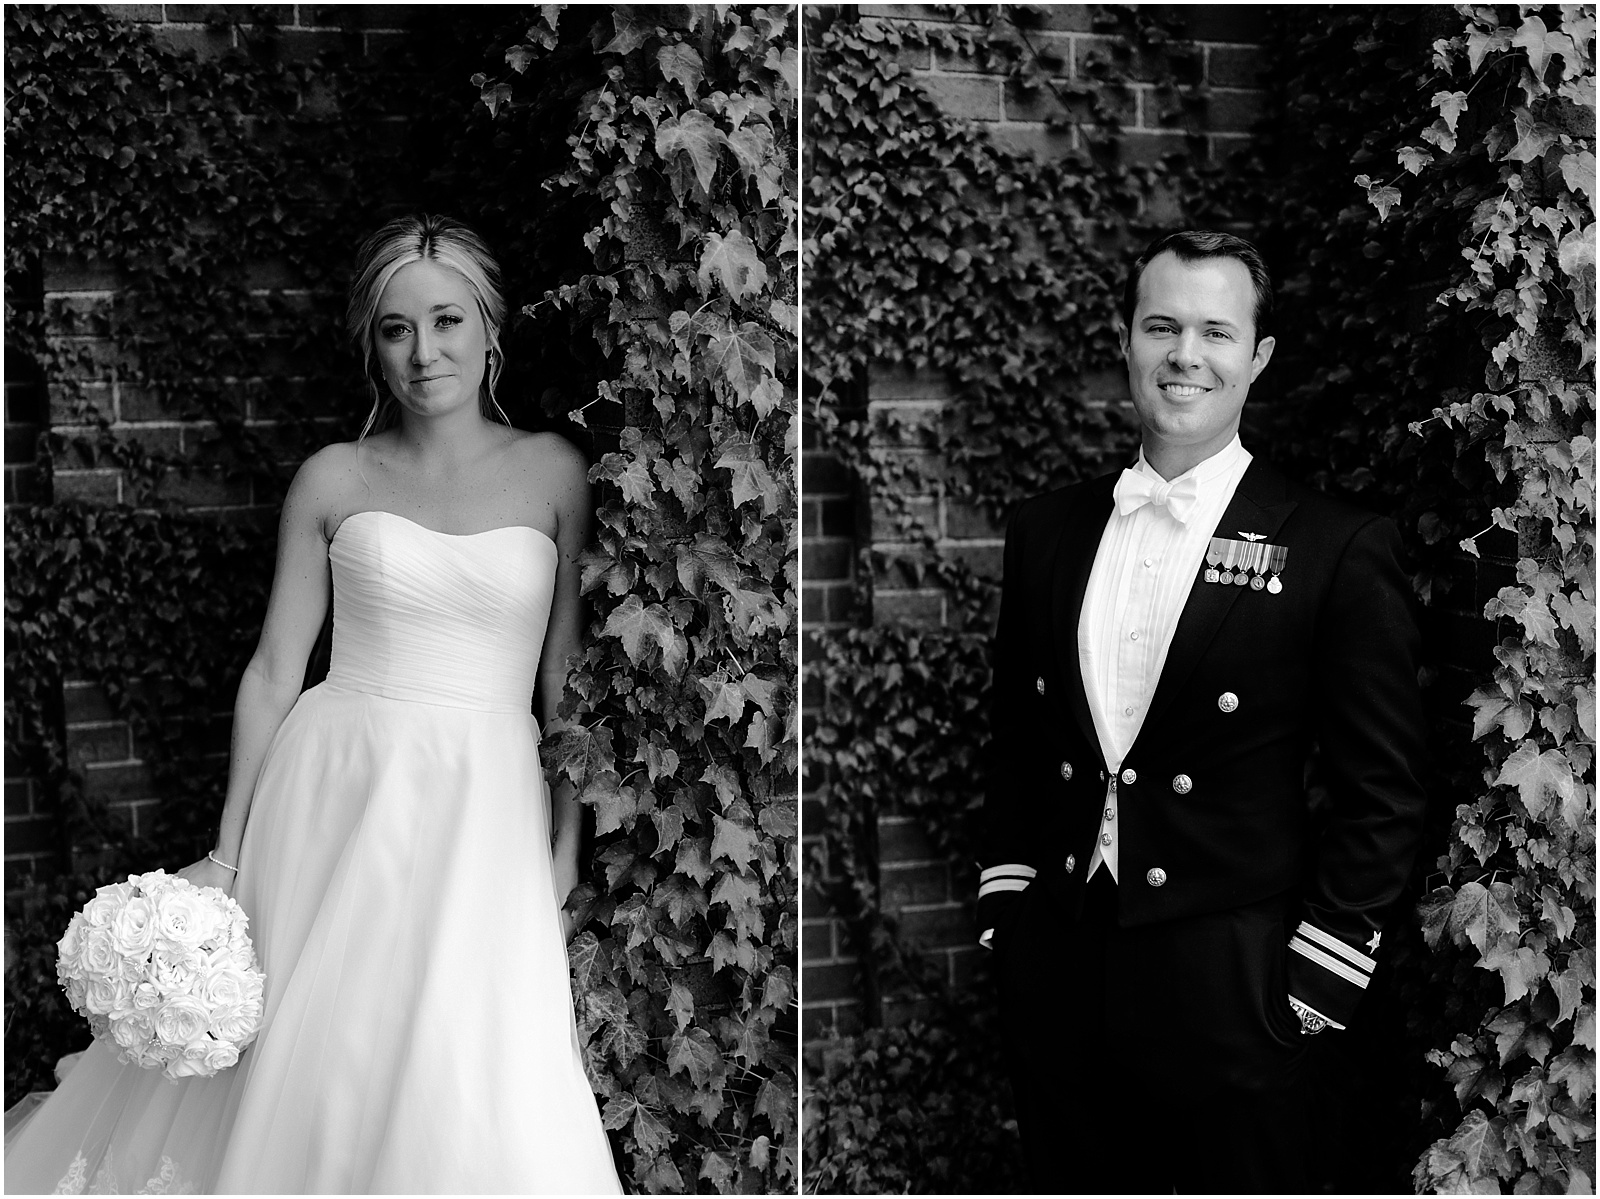 glen_echo_st_louis_mo_wedding_0058.jpg